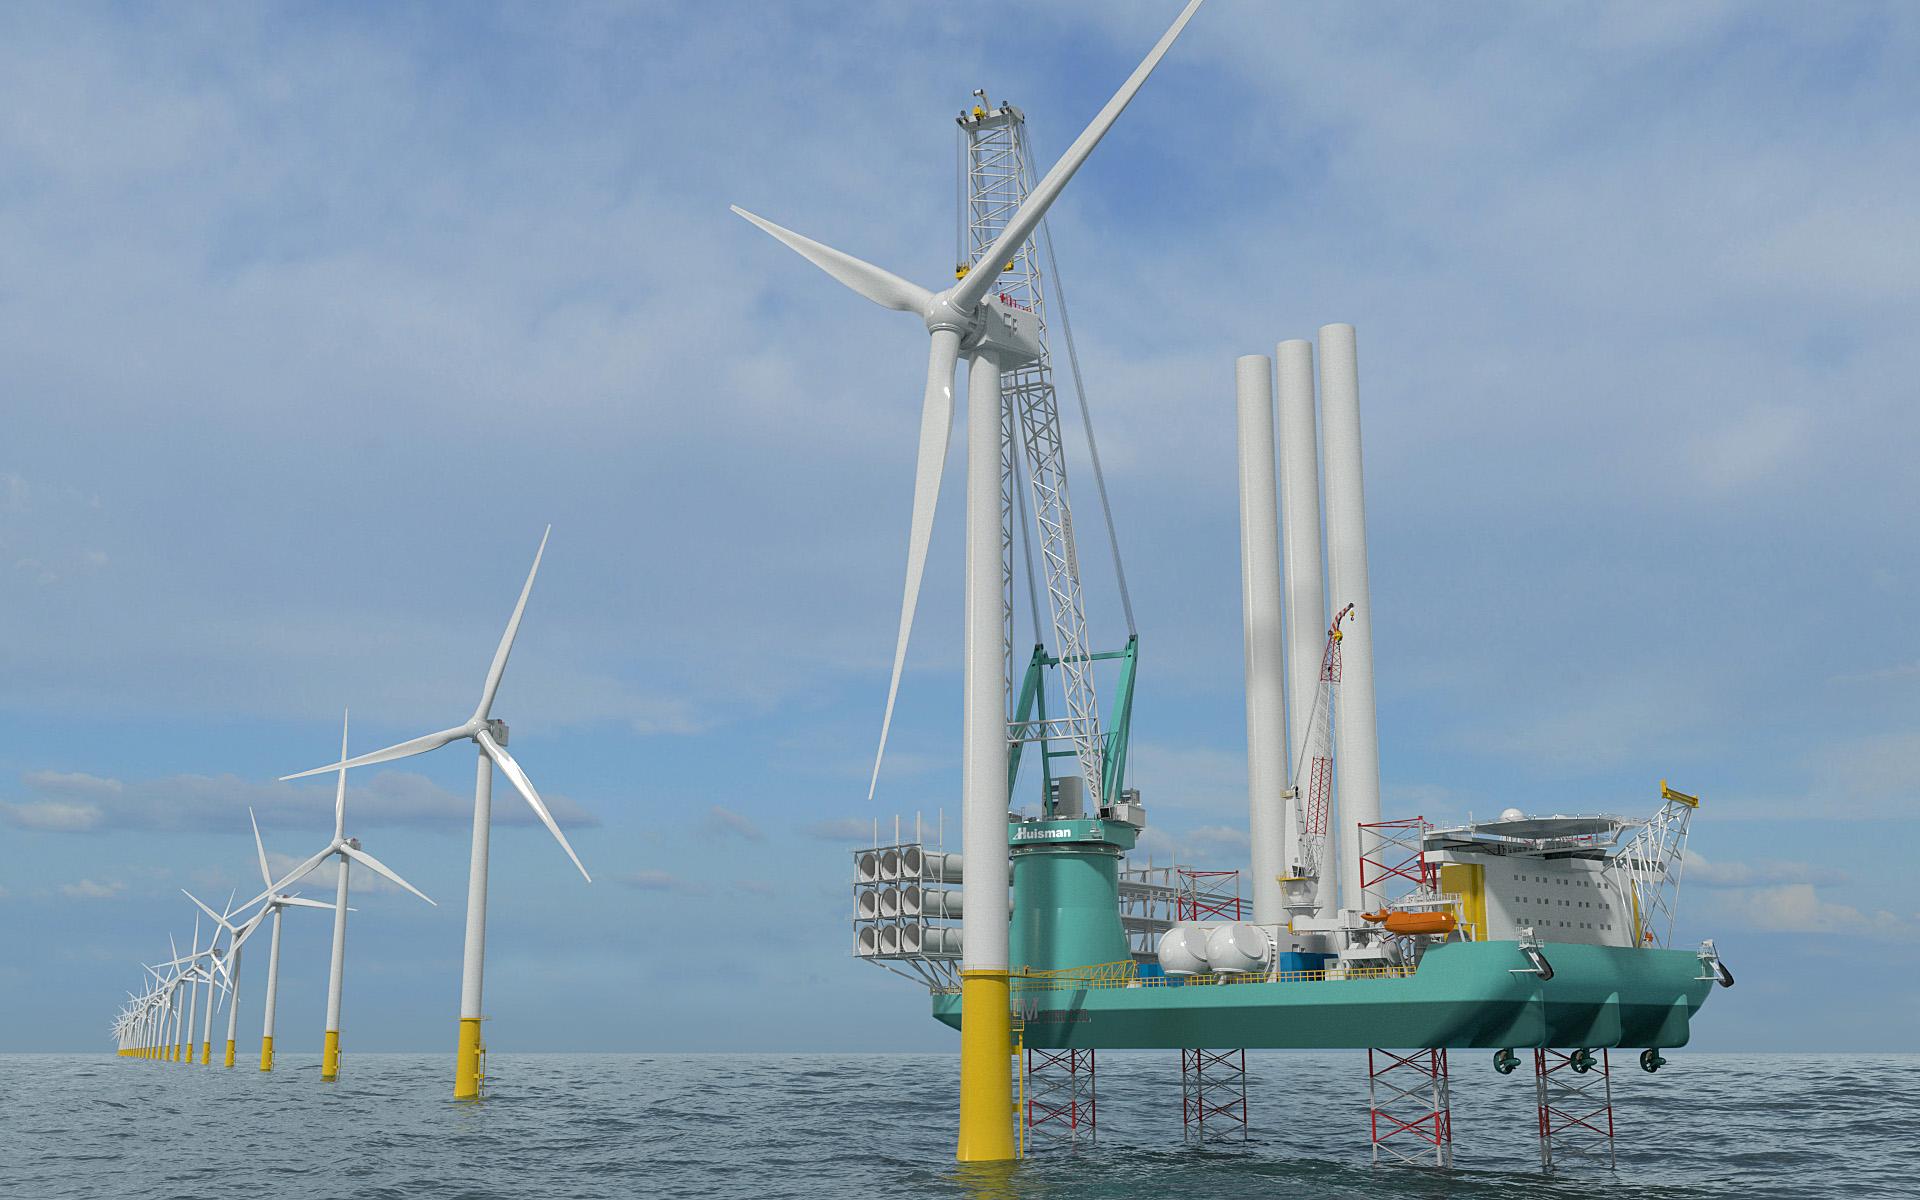 Huisman to build 2600-mt crane for OIM Wind's new installation vessel